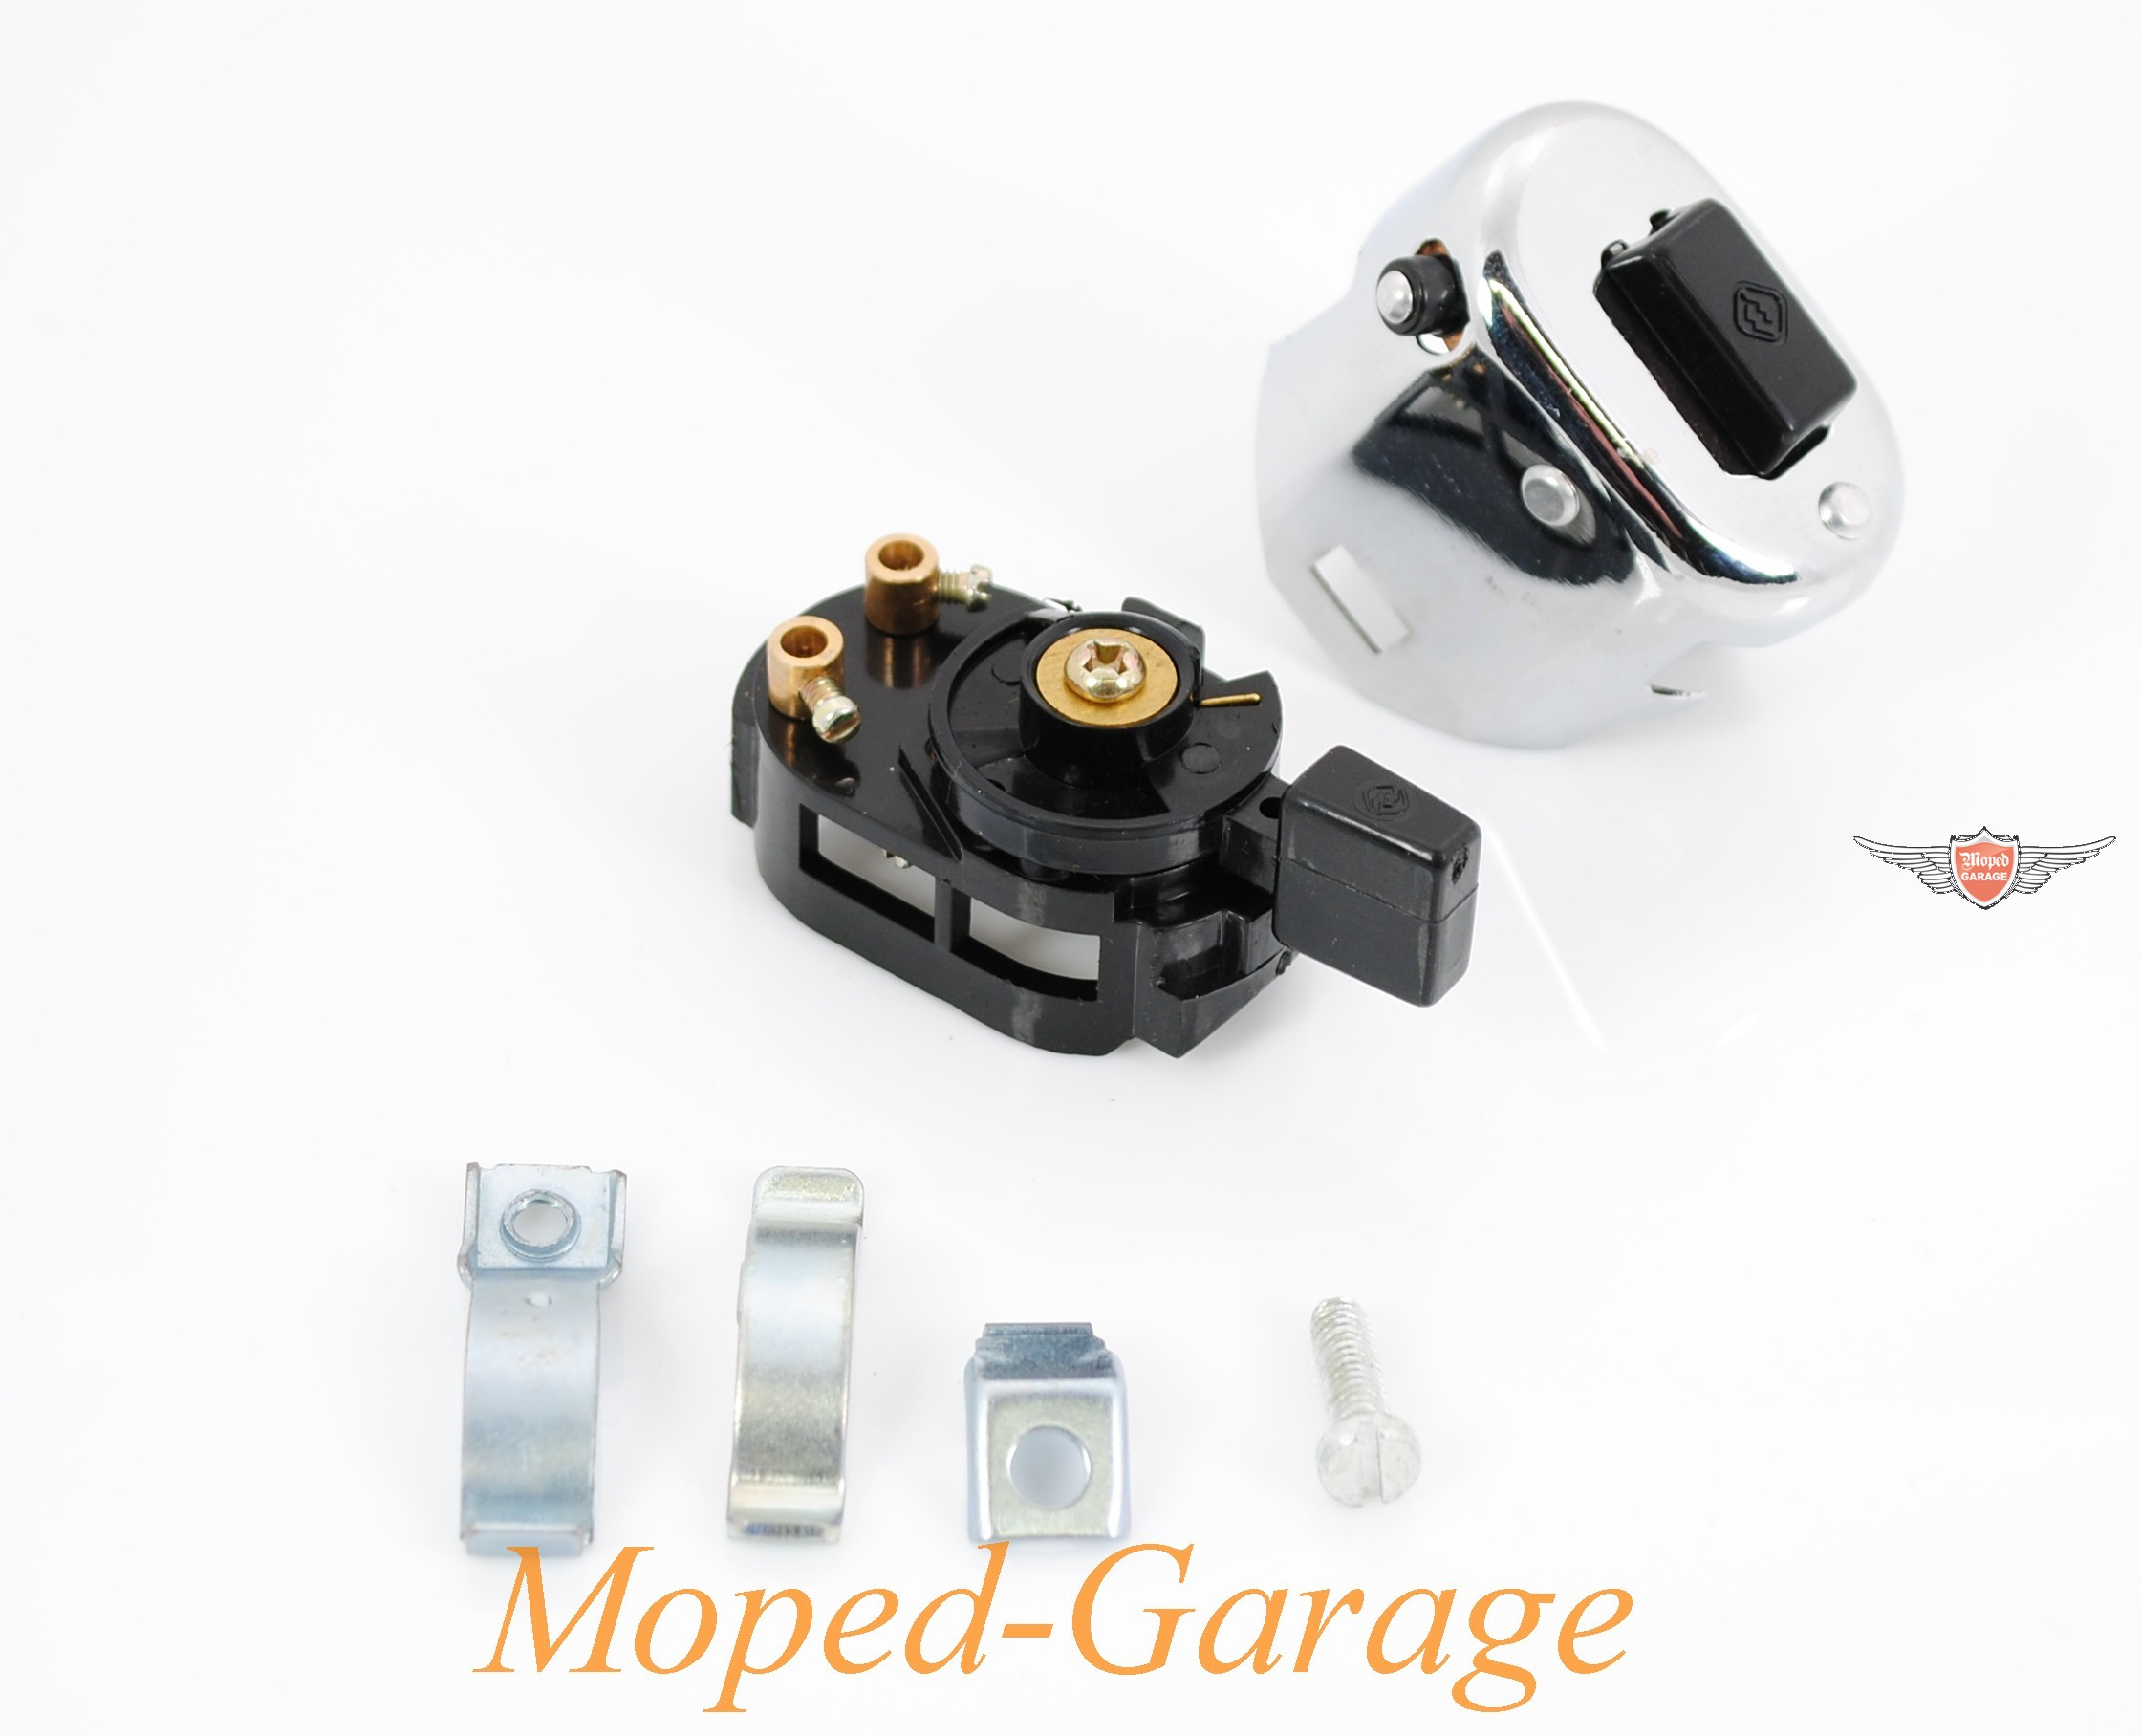 moped mofa moped mokick kkr cs universal. Black Bedroom Furniture Sets. Home Design Ideas